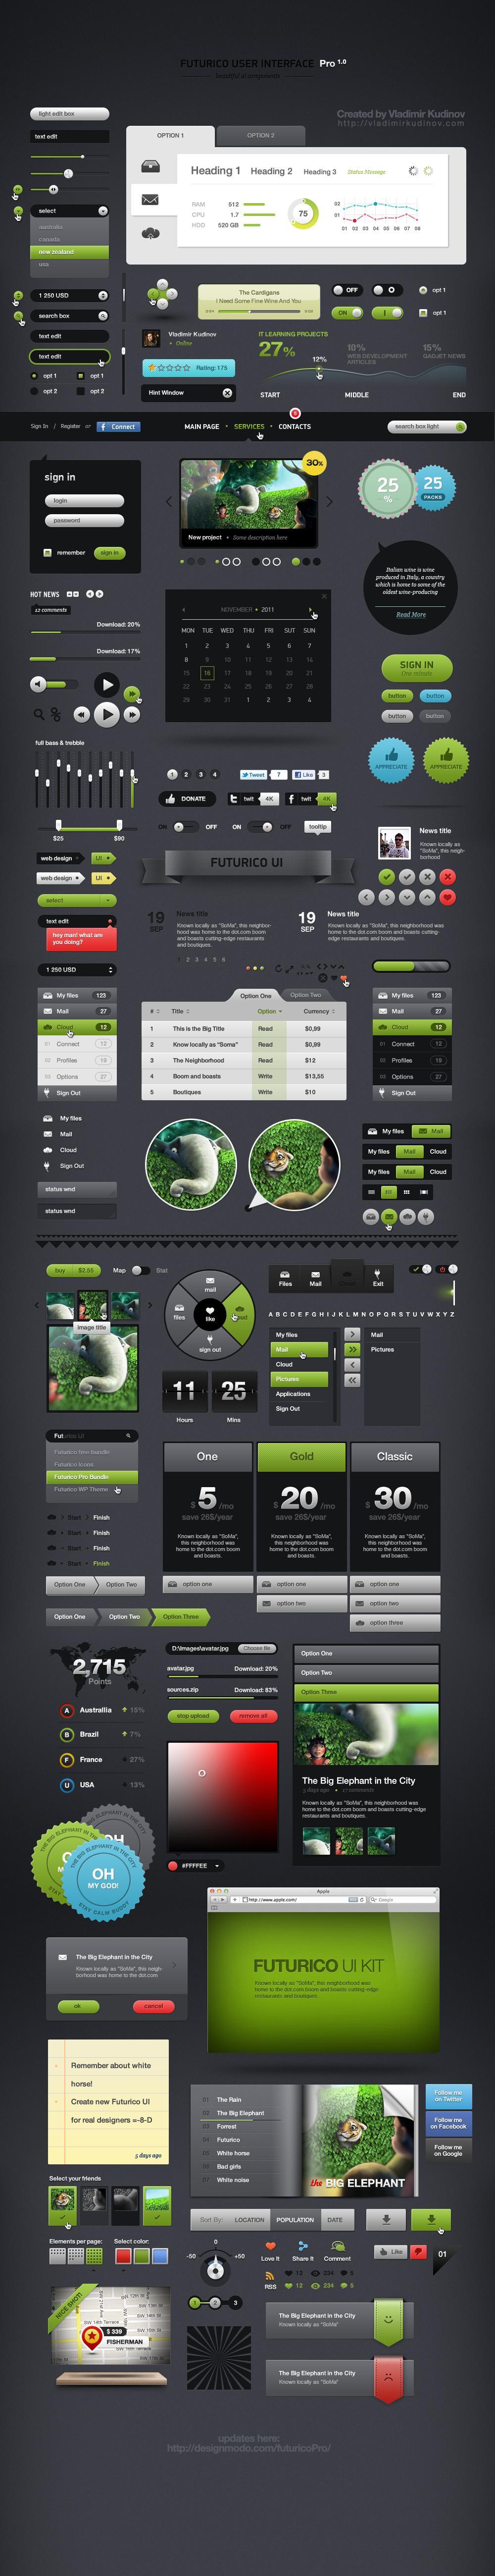 Futurico-pro-preview1.jpg (1000×5200)